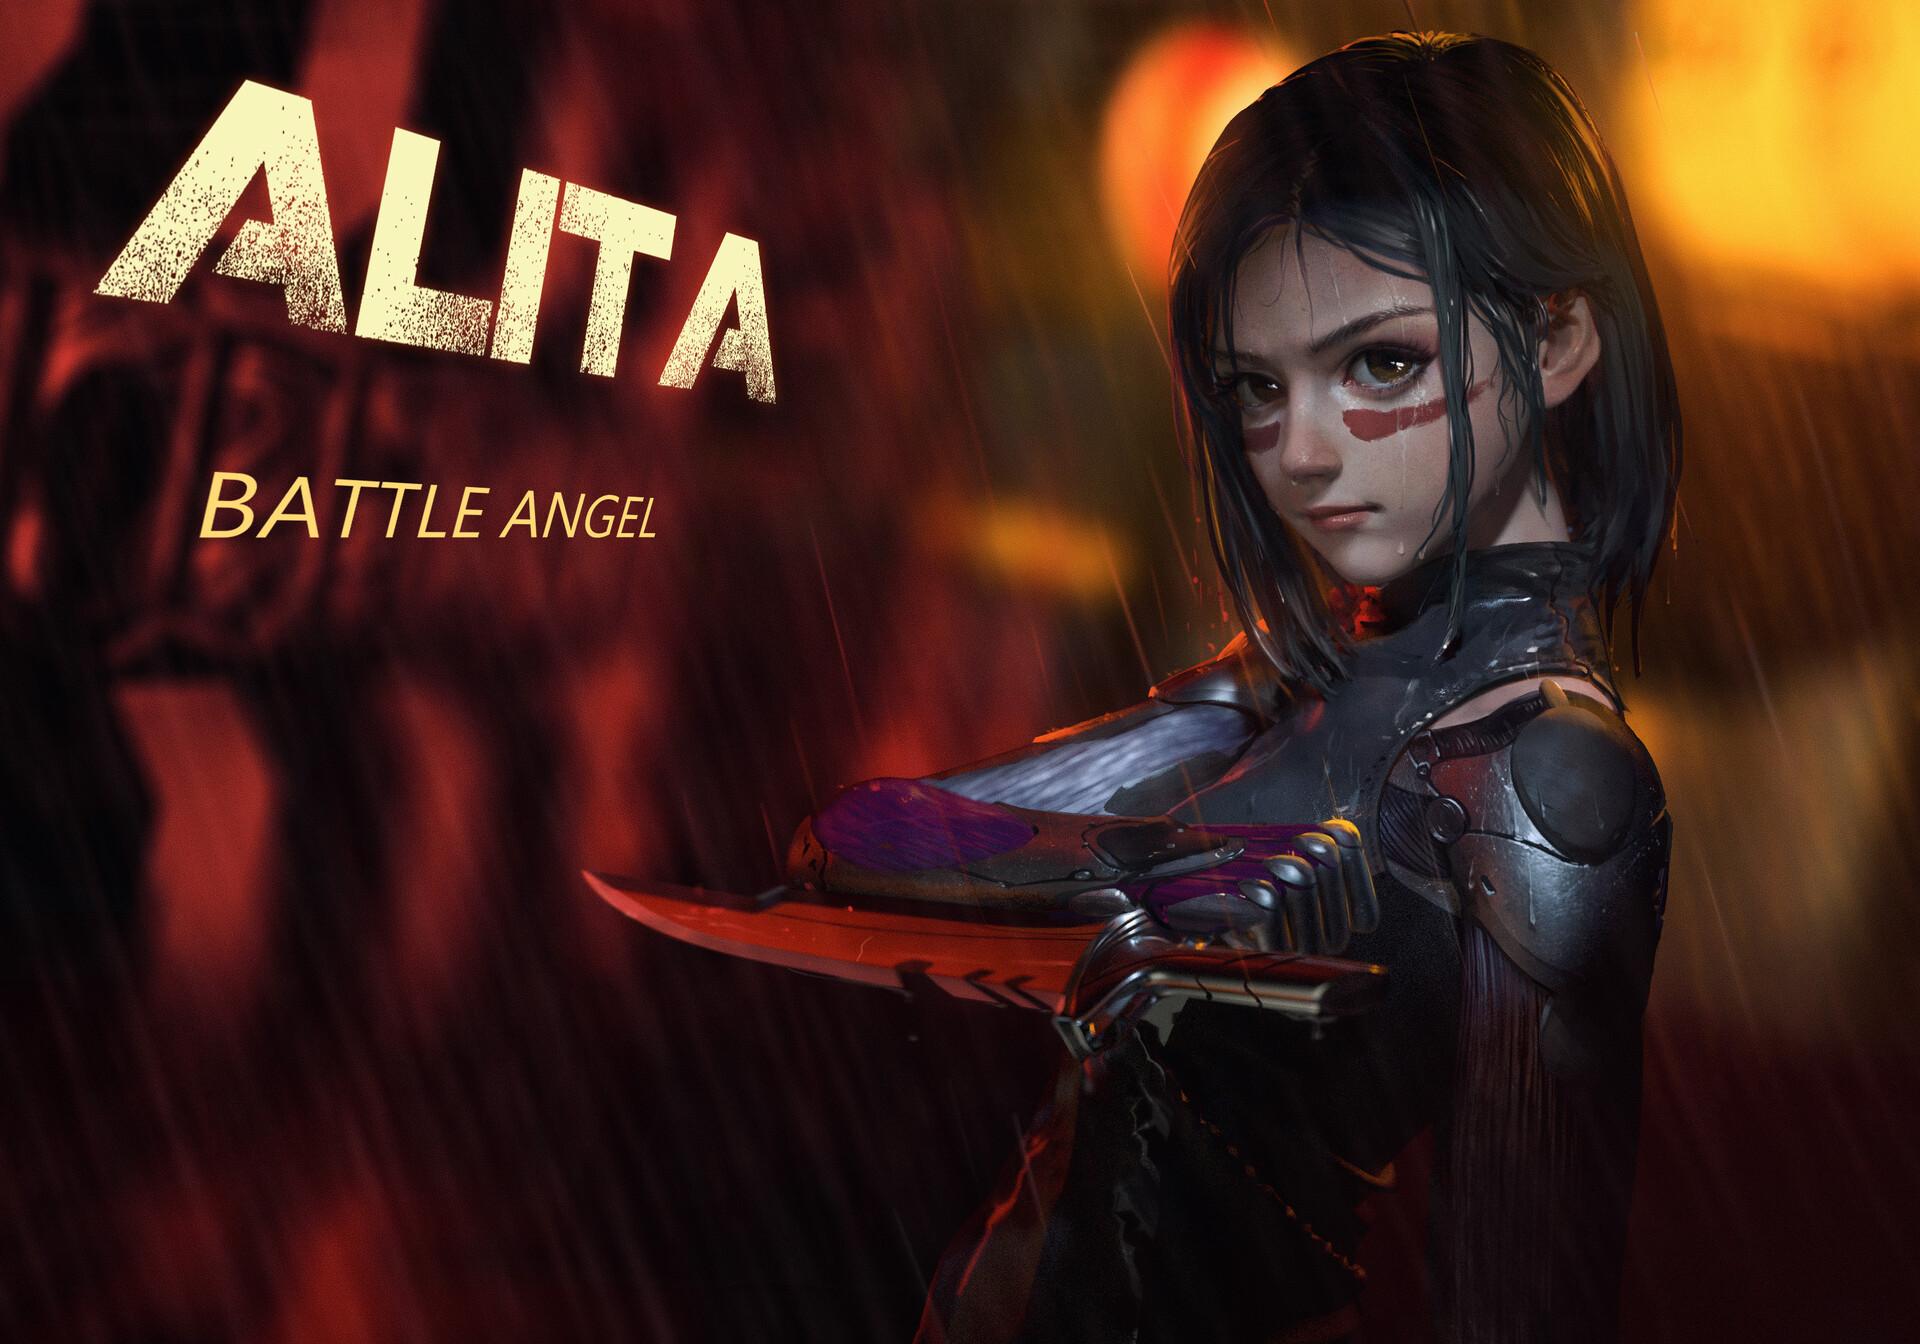 HDoboi.Kiev.ua - Алита боевой ангел обои на телефон, Alita Battle Angel